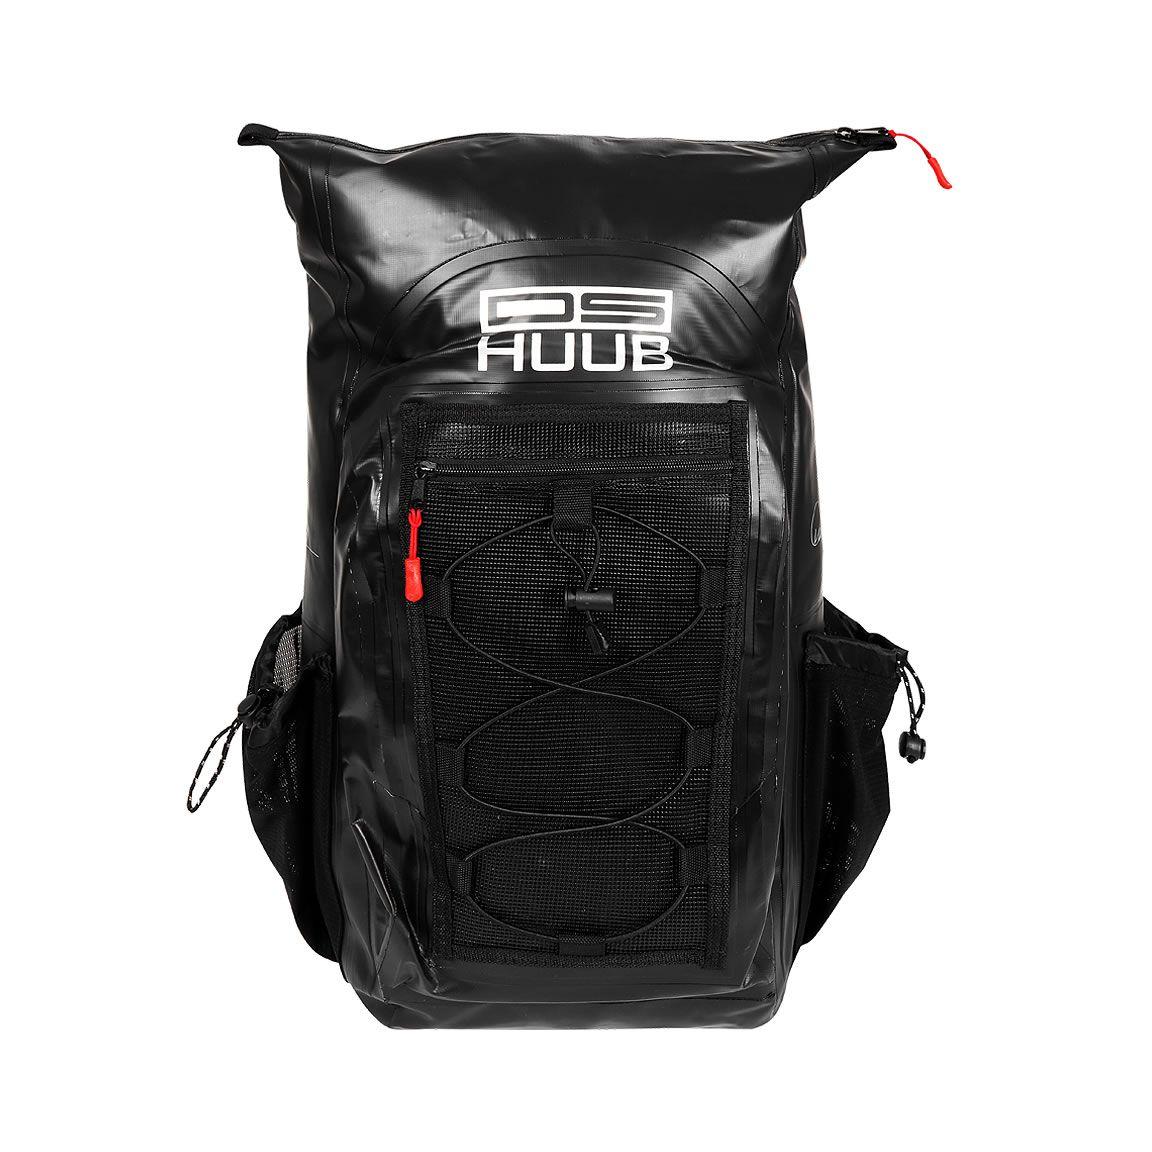 HUUB DS DECK Bag